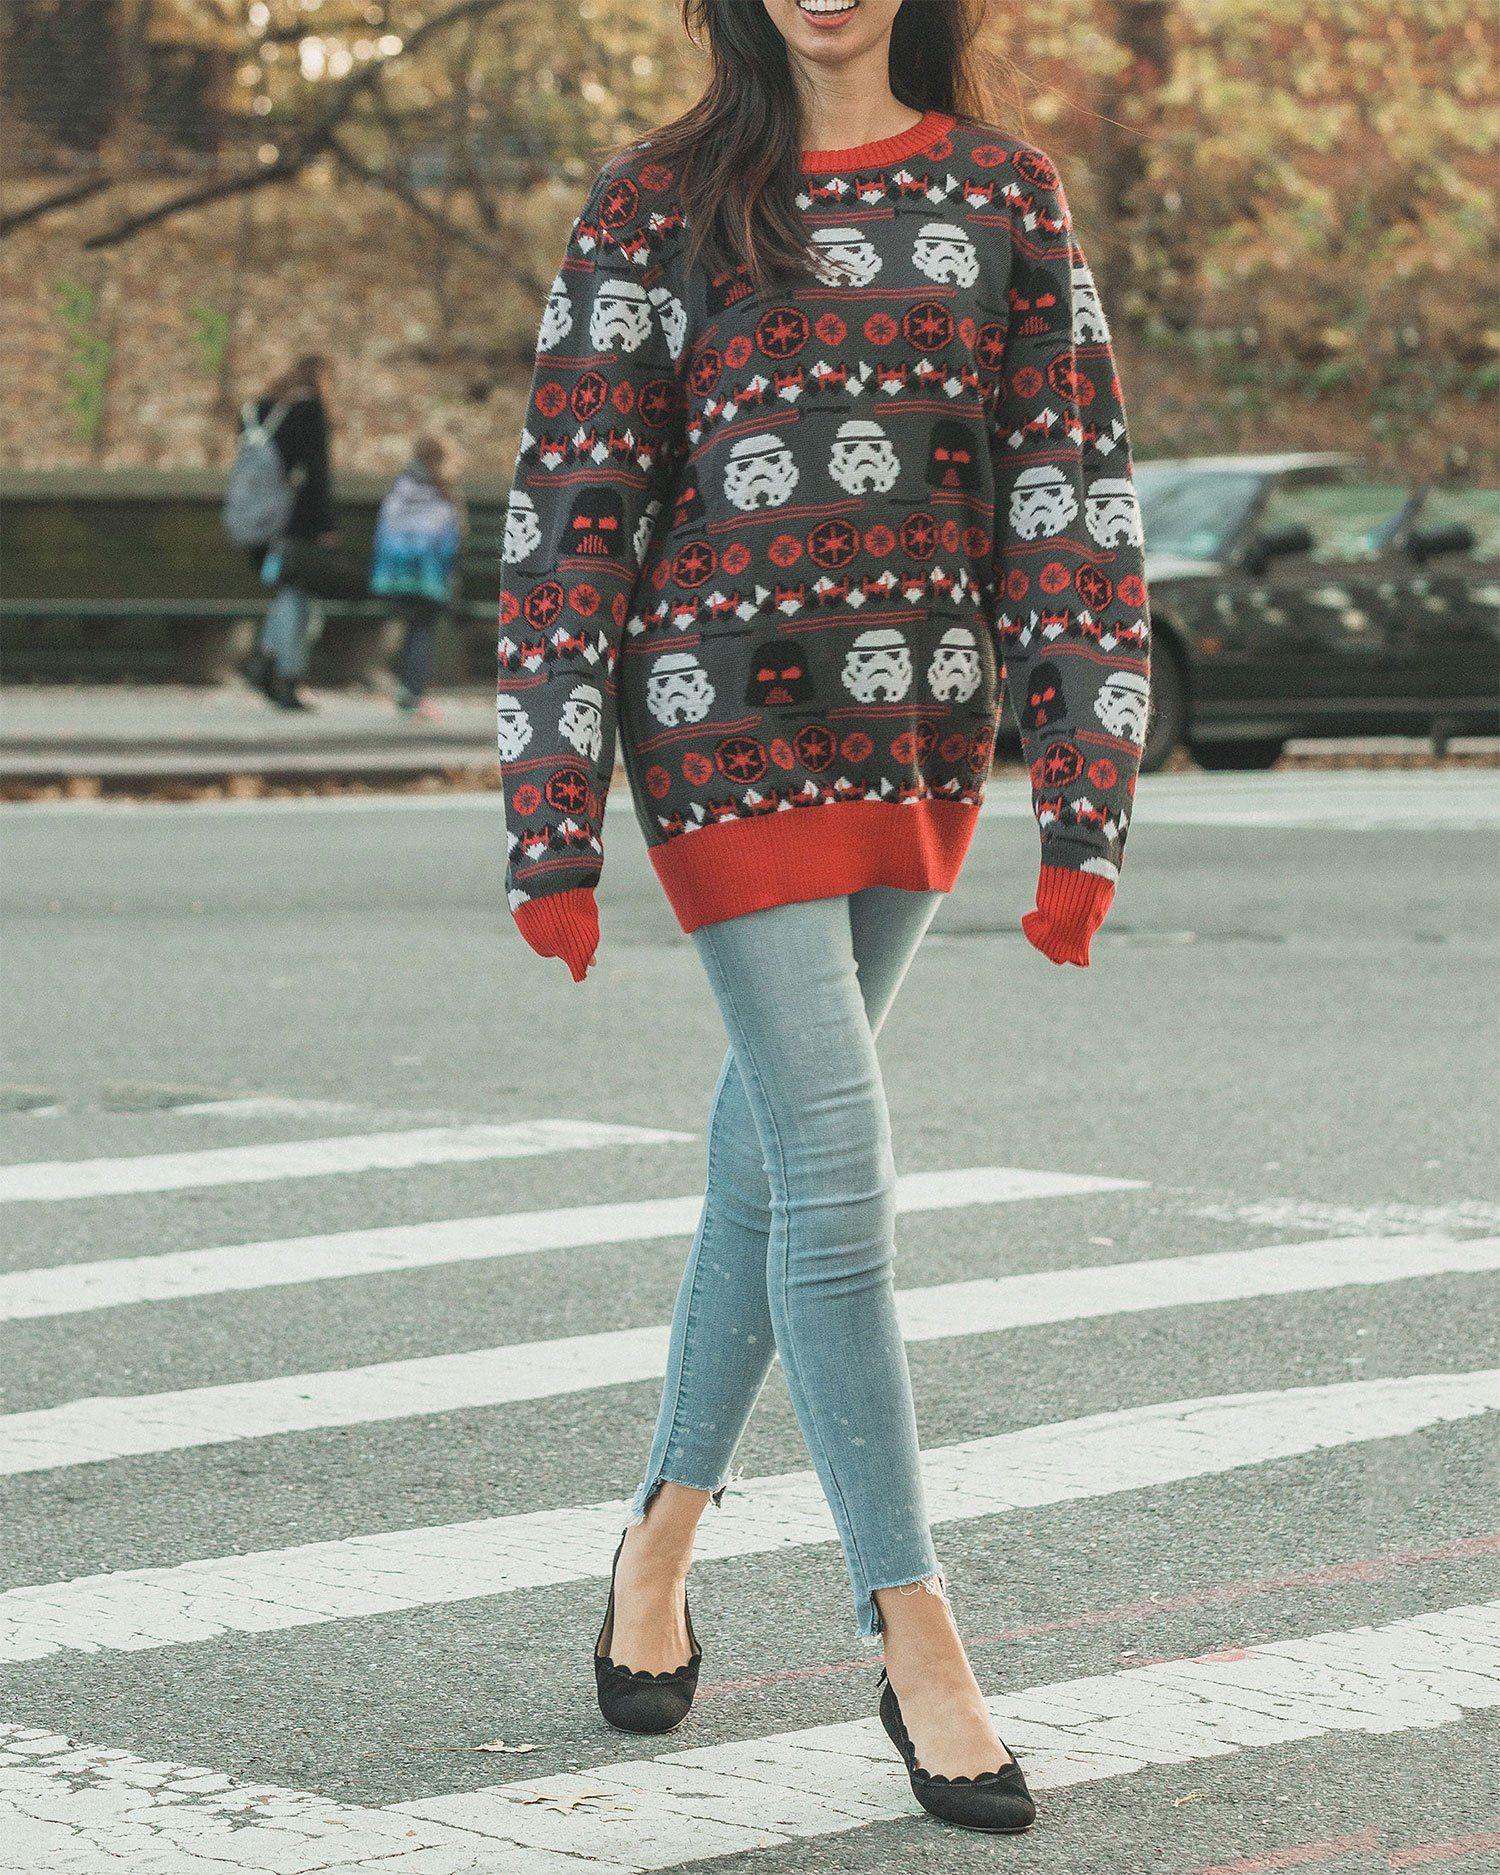 947fbf6de212 17 Ugly Christmas Sweater Ideas